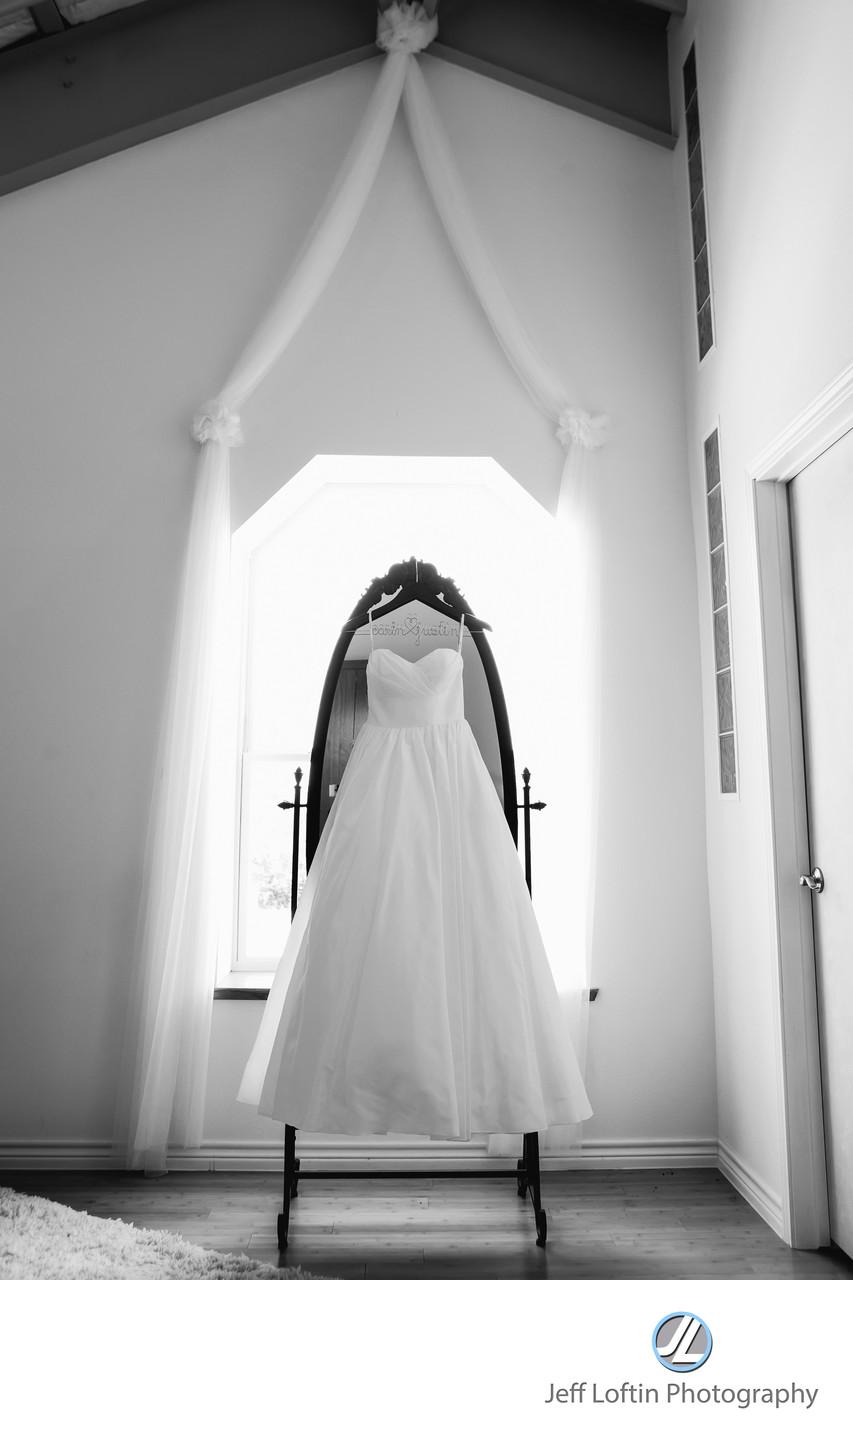 Austin Texas Wedding Dress Photo Austin Wedding And Portrait Photographer Jeff Loftin Photography,Wedding Dresses For Short Plus Size Women